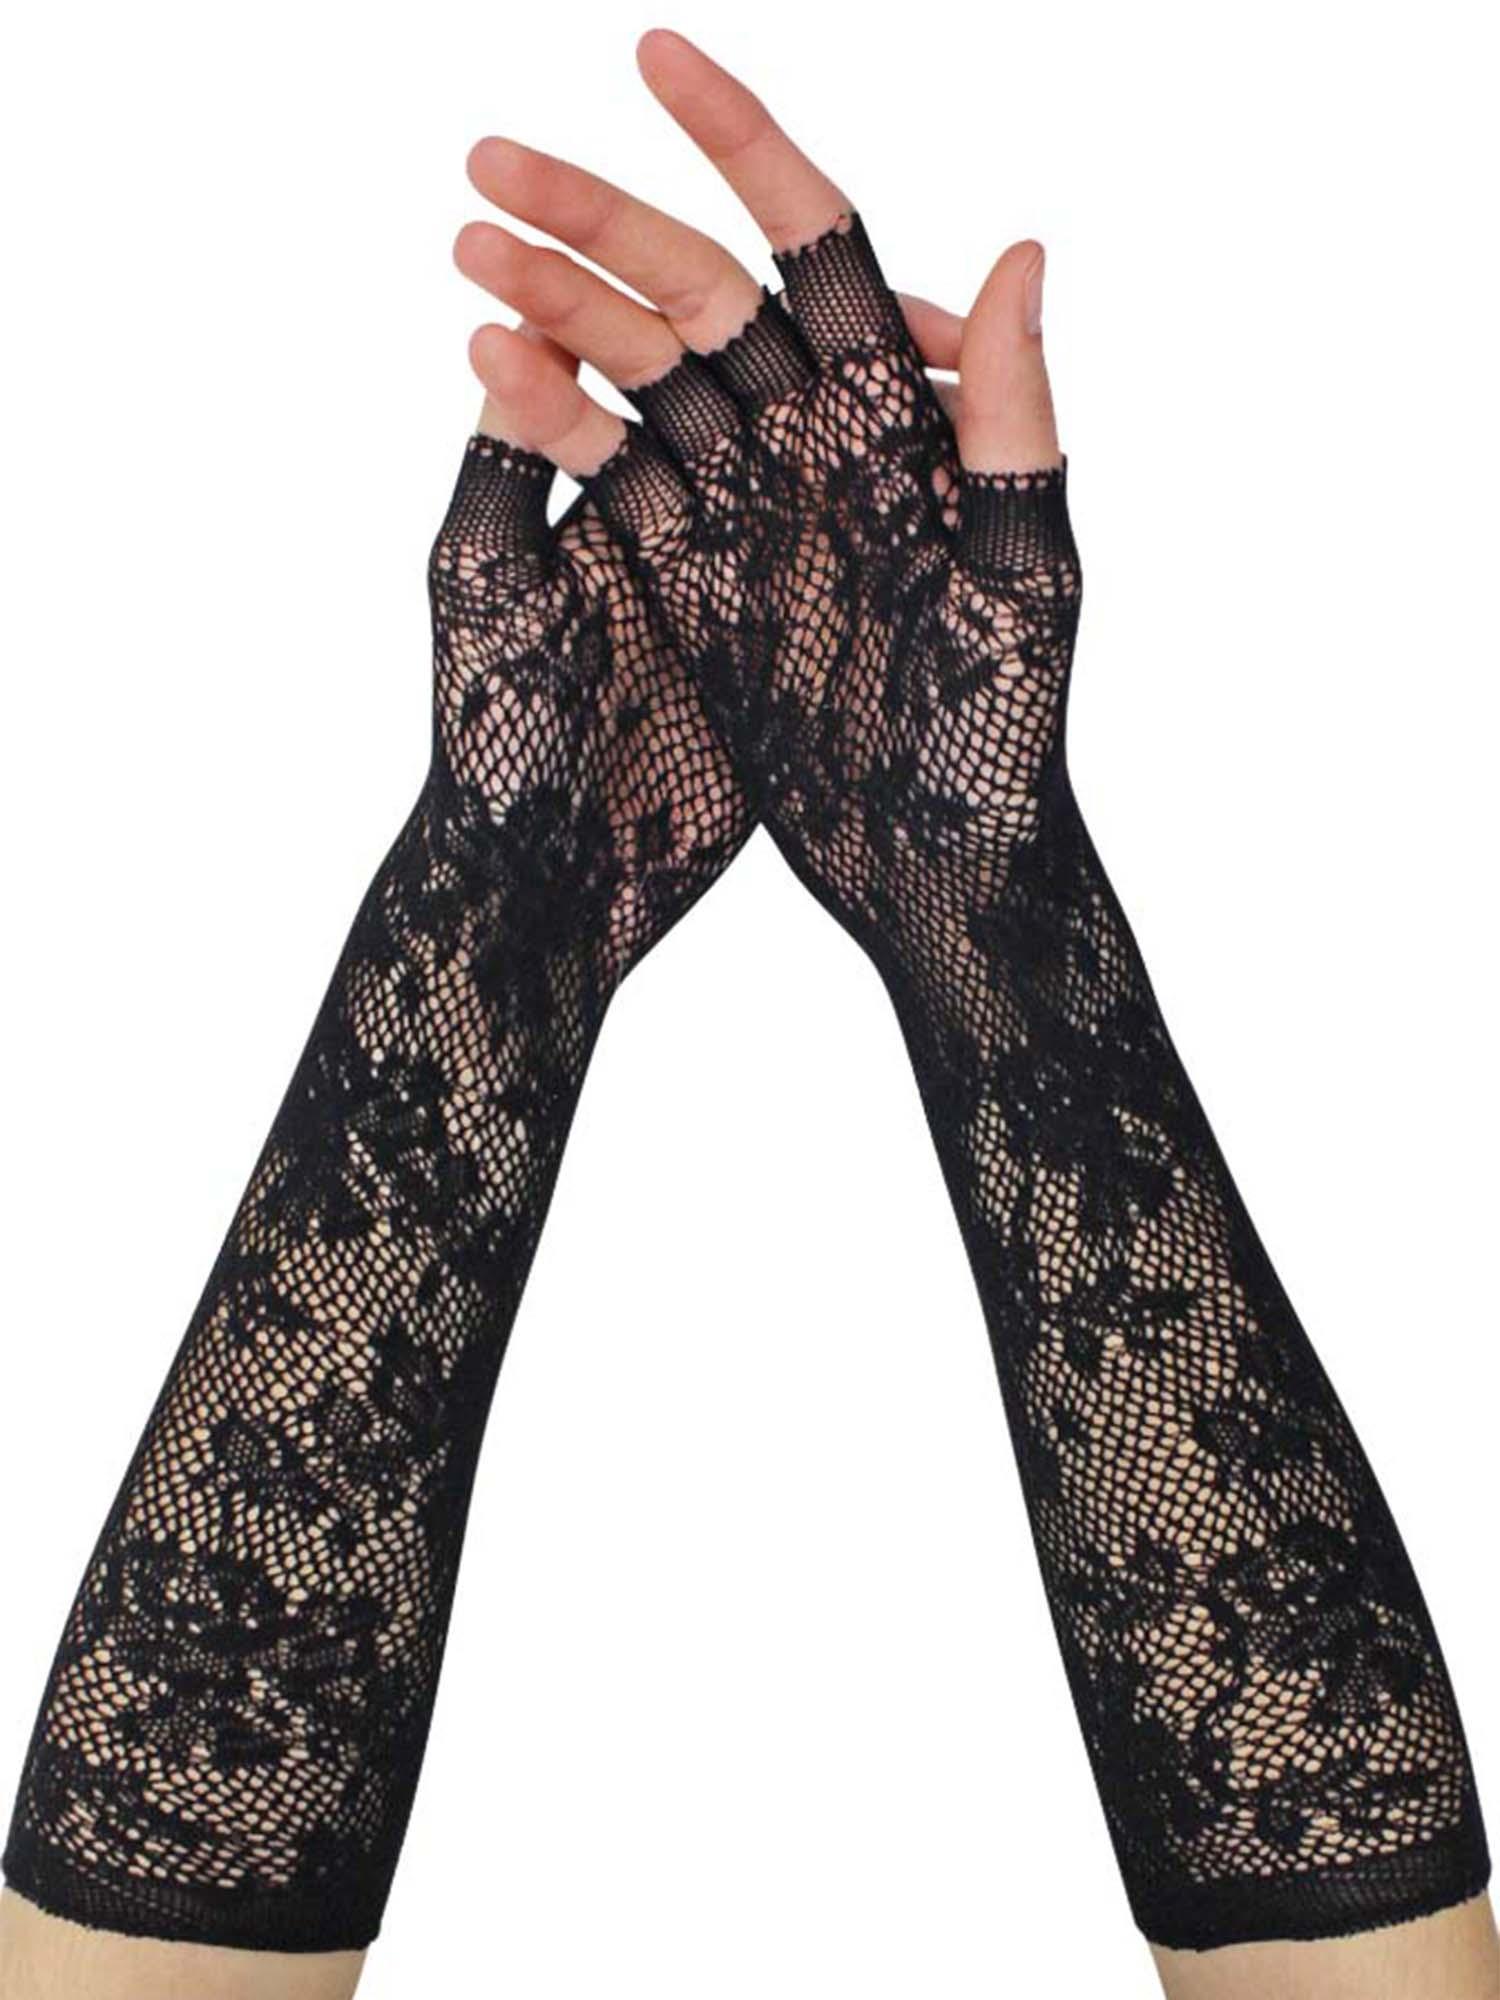 Vintage Orange Wrist Length Nylon Gloves---8 long---Size 6 to 6 12 -Glove Auction #1730-0719